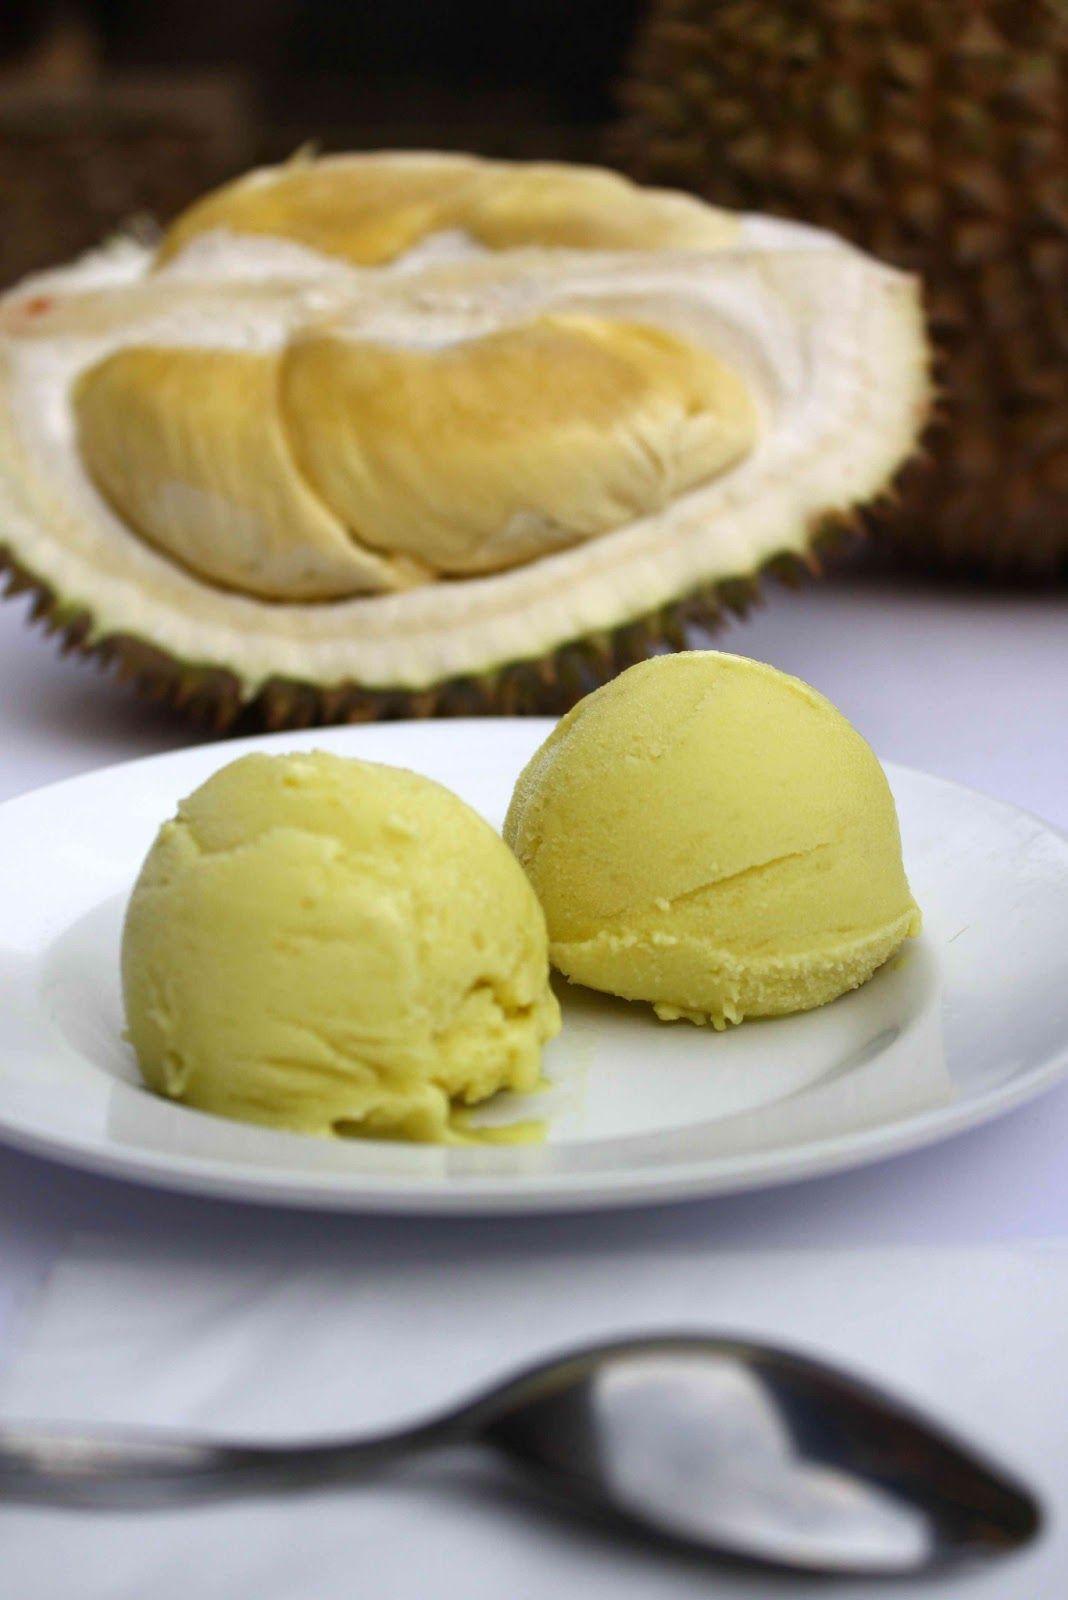 Yonanas Alat Pembuat Es Krim Fruit Yogurt Juicer Sorbet Blender Buah Oxone Dessert Maker Ox 873 Ice Cream Year Of The Durian Recipe